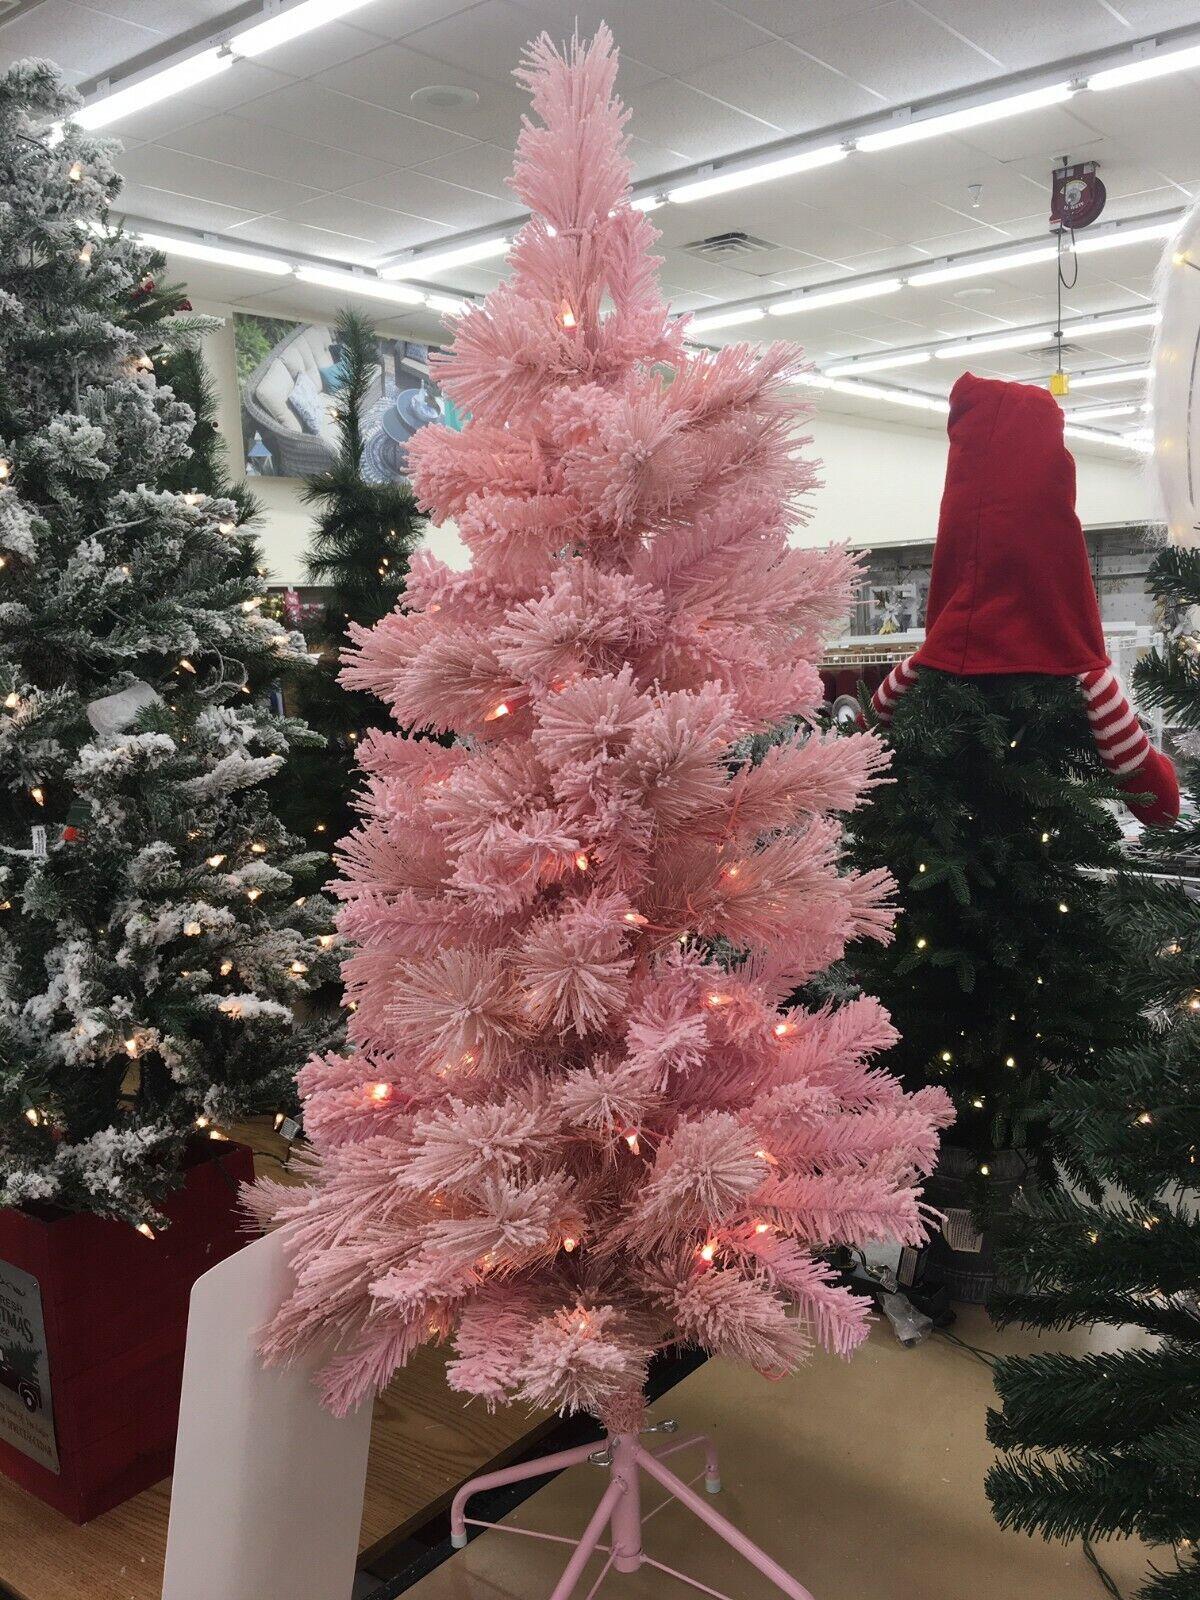 Vickerman 12ft Flocked White On Green 4768t Christmas Tree 2150 Clear Dura Lit For Sale Online Ebay